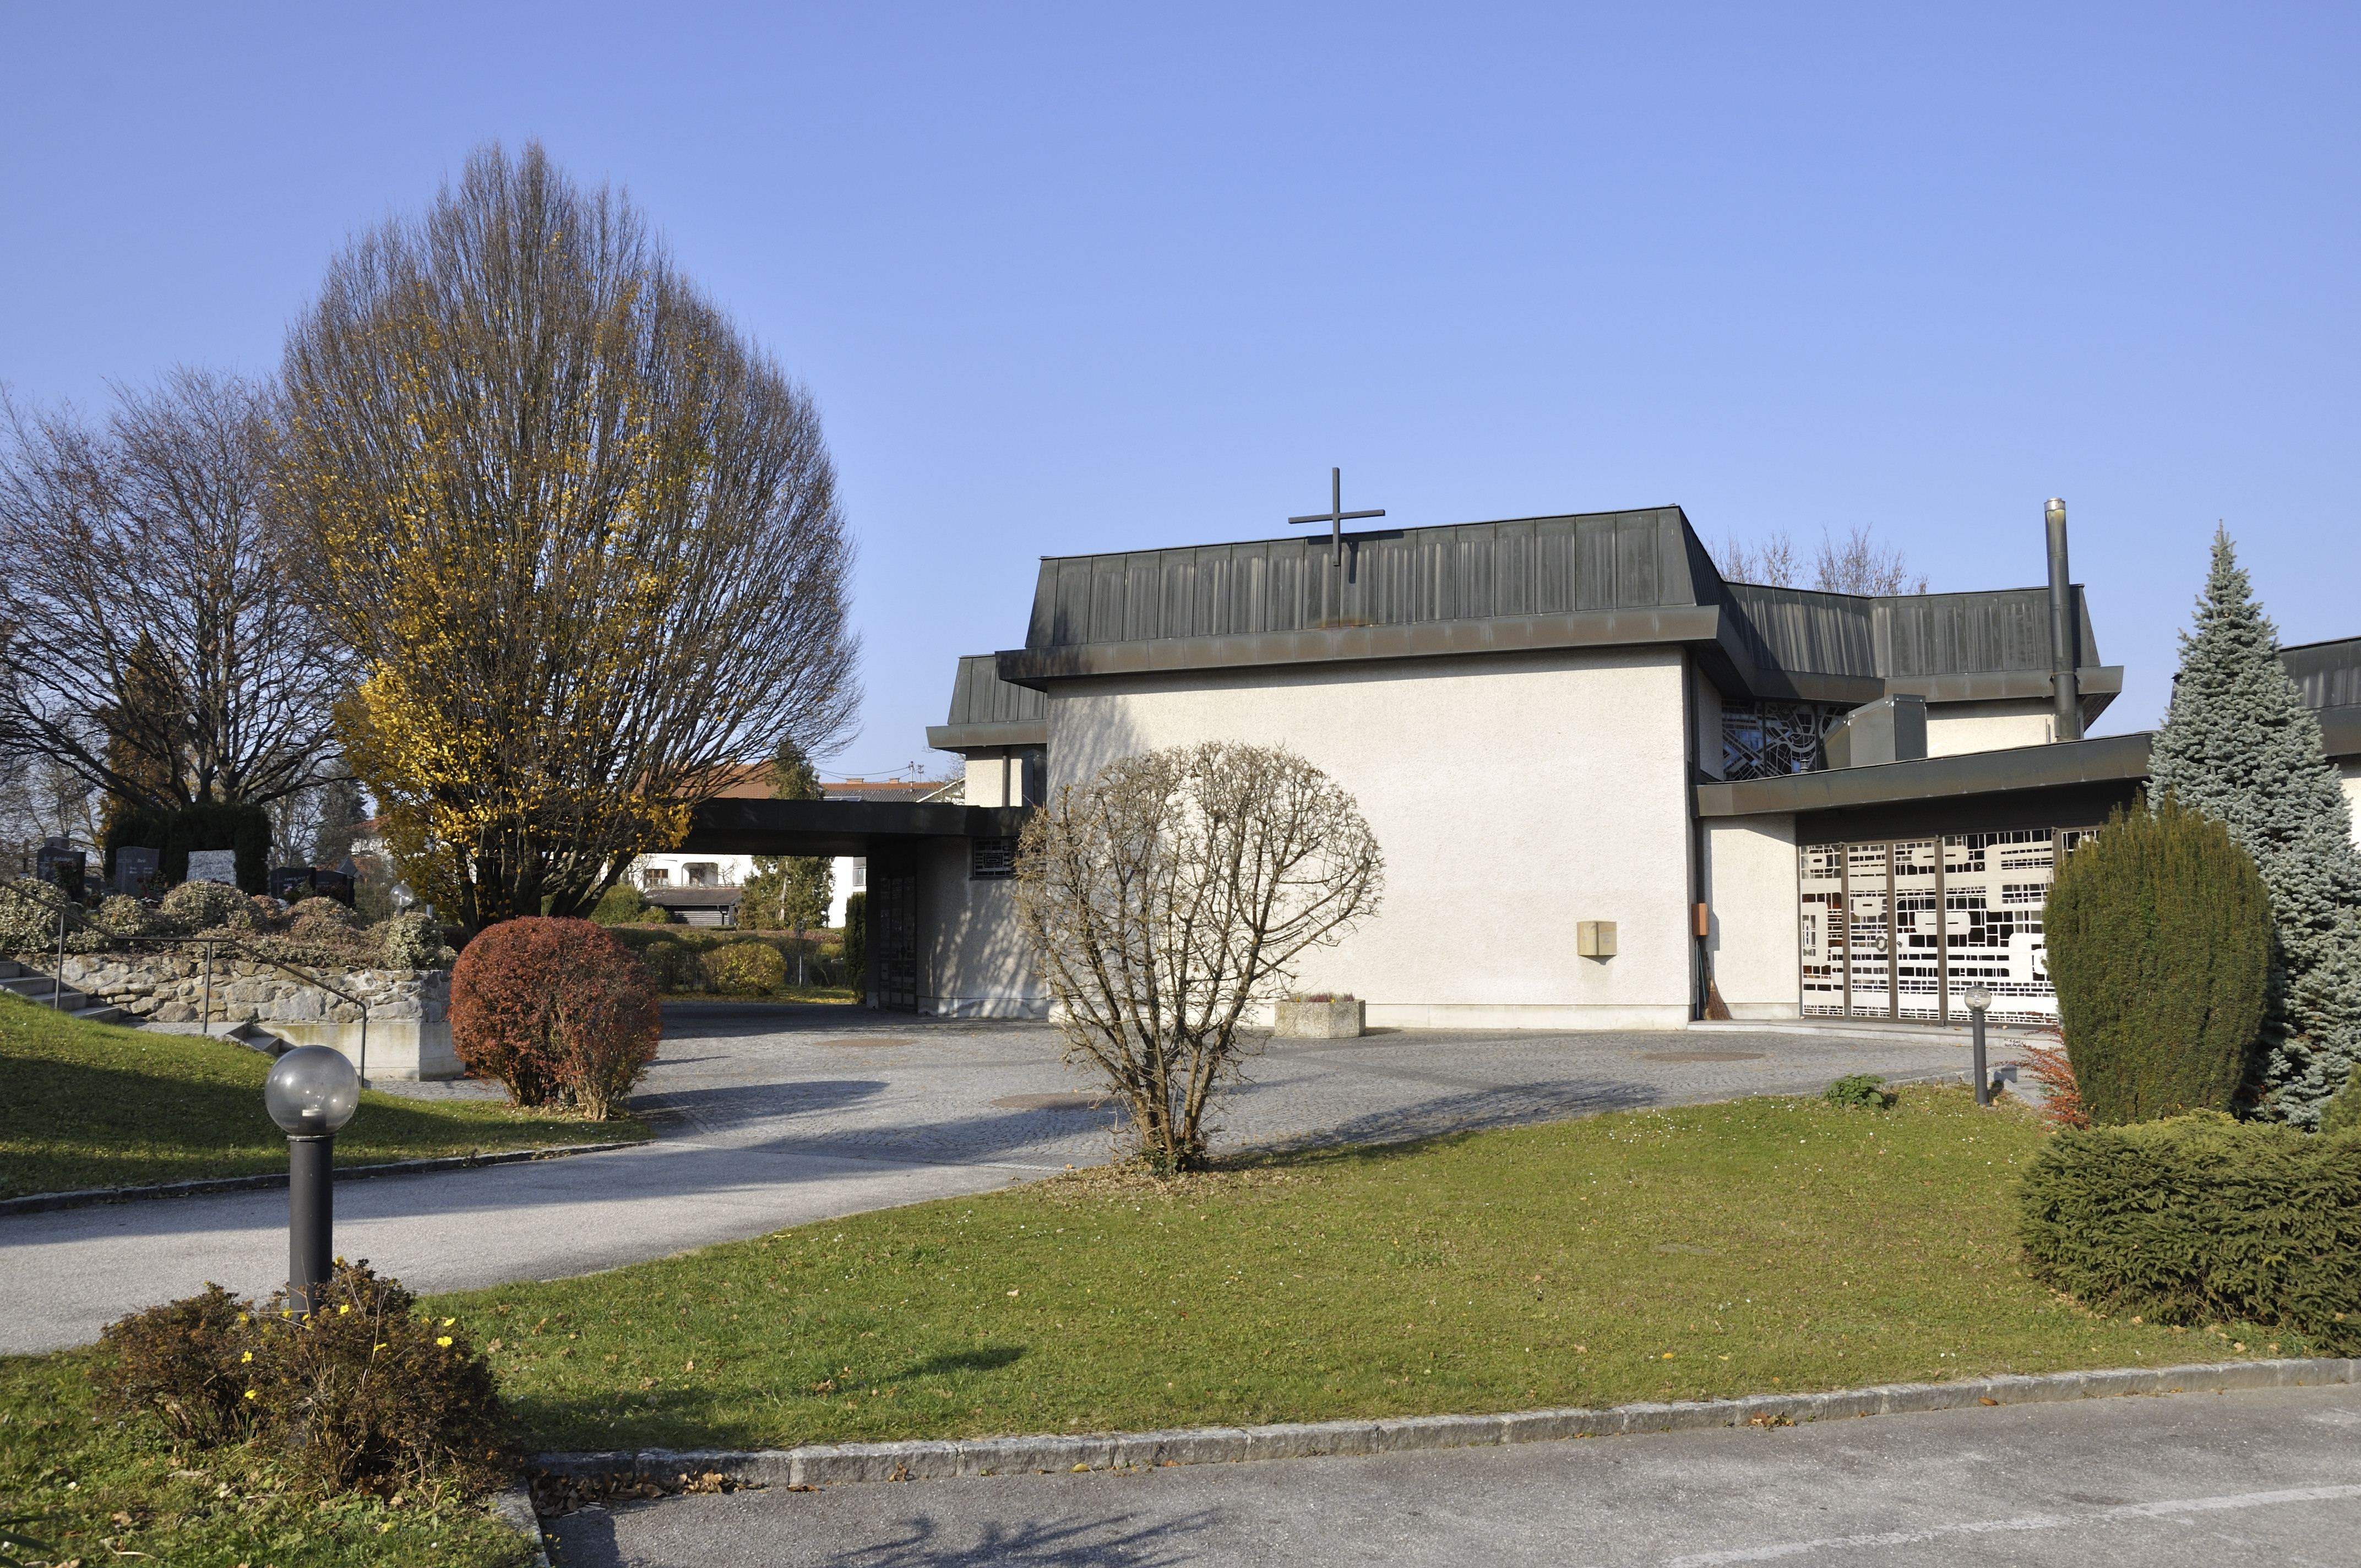 Pasching, Austria Events Next Month | Eventbrite